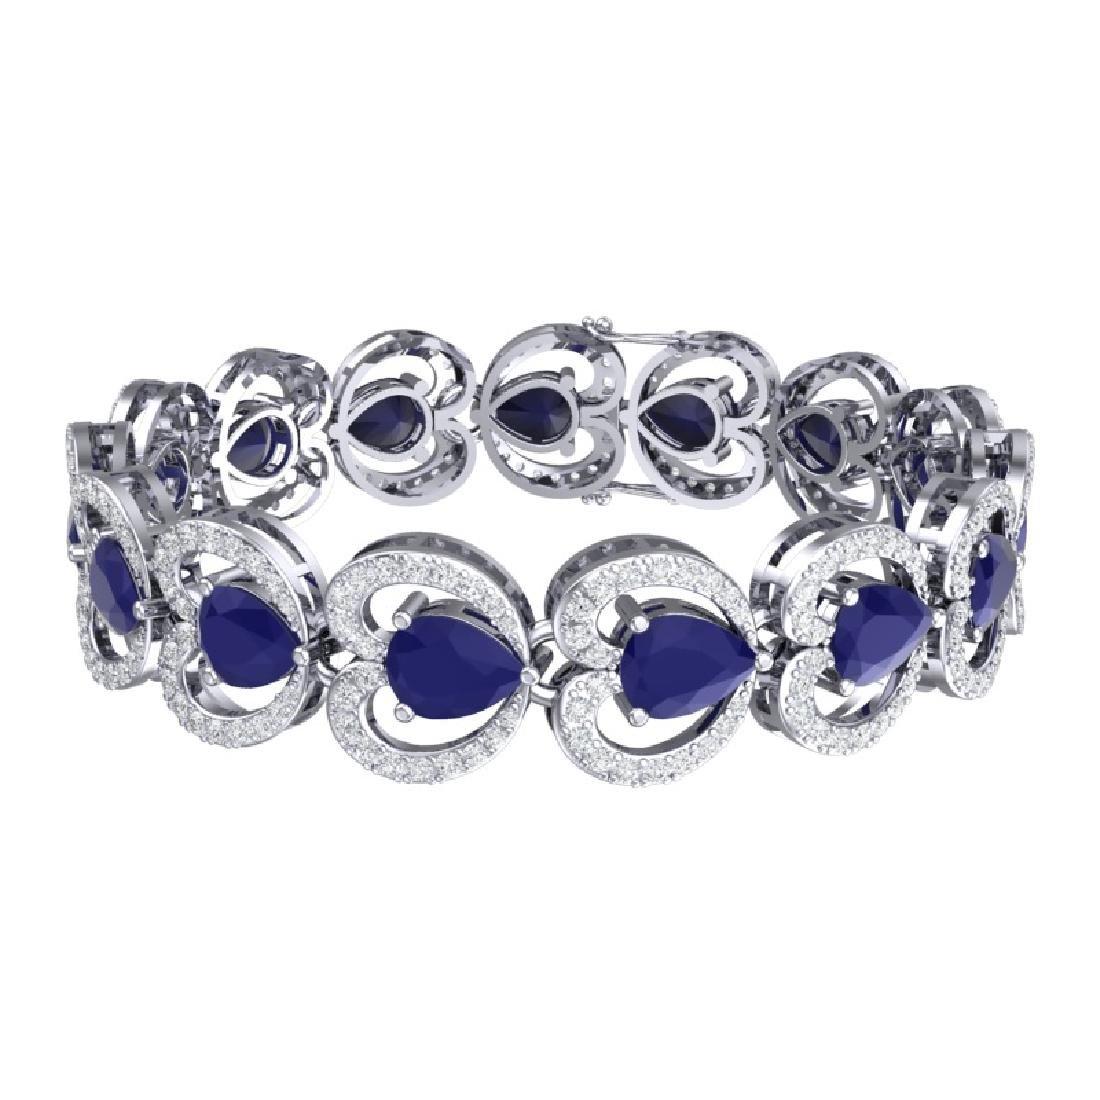 32.15 CTW Royalty Sapphire & VS Diamond Bracelet 18K - 2